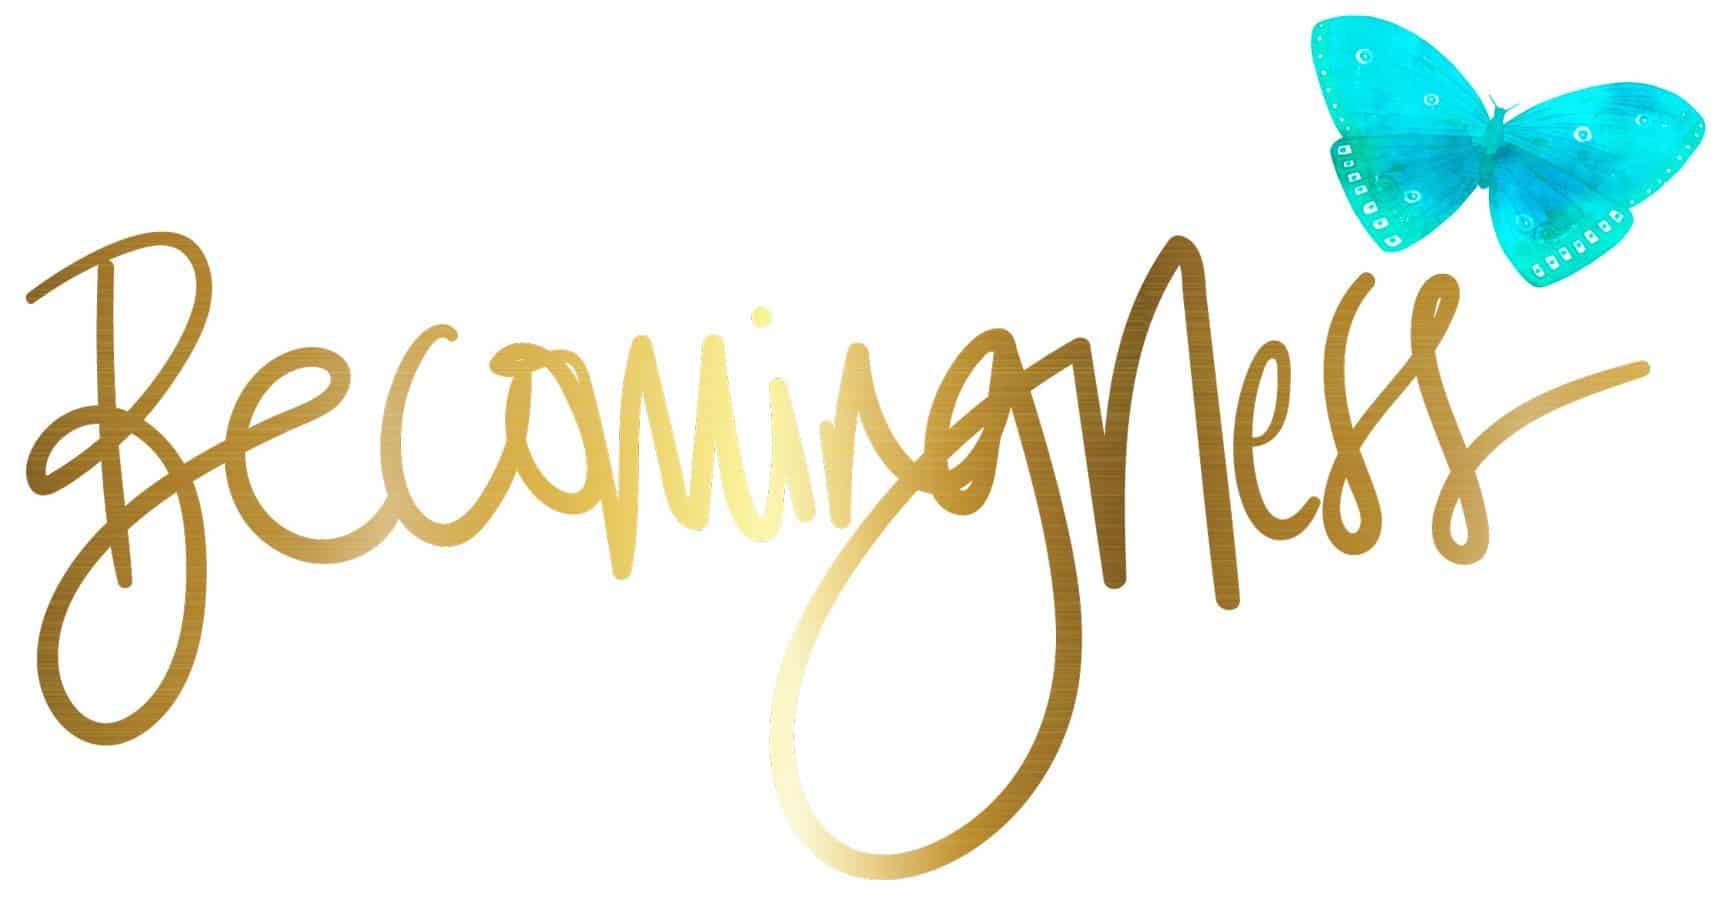 Becomingness logo